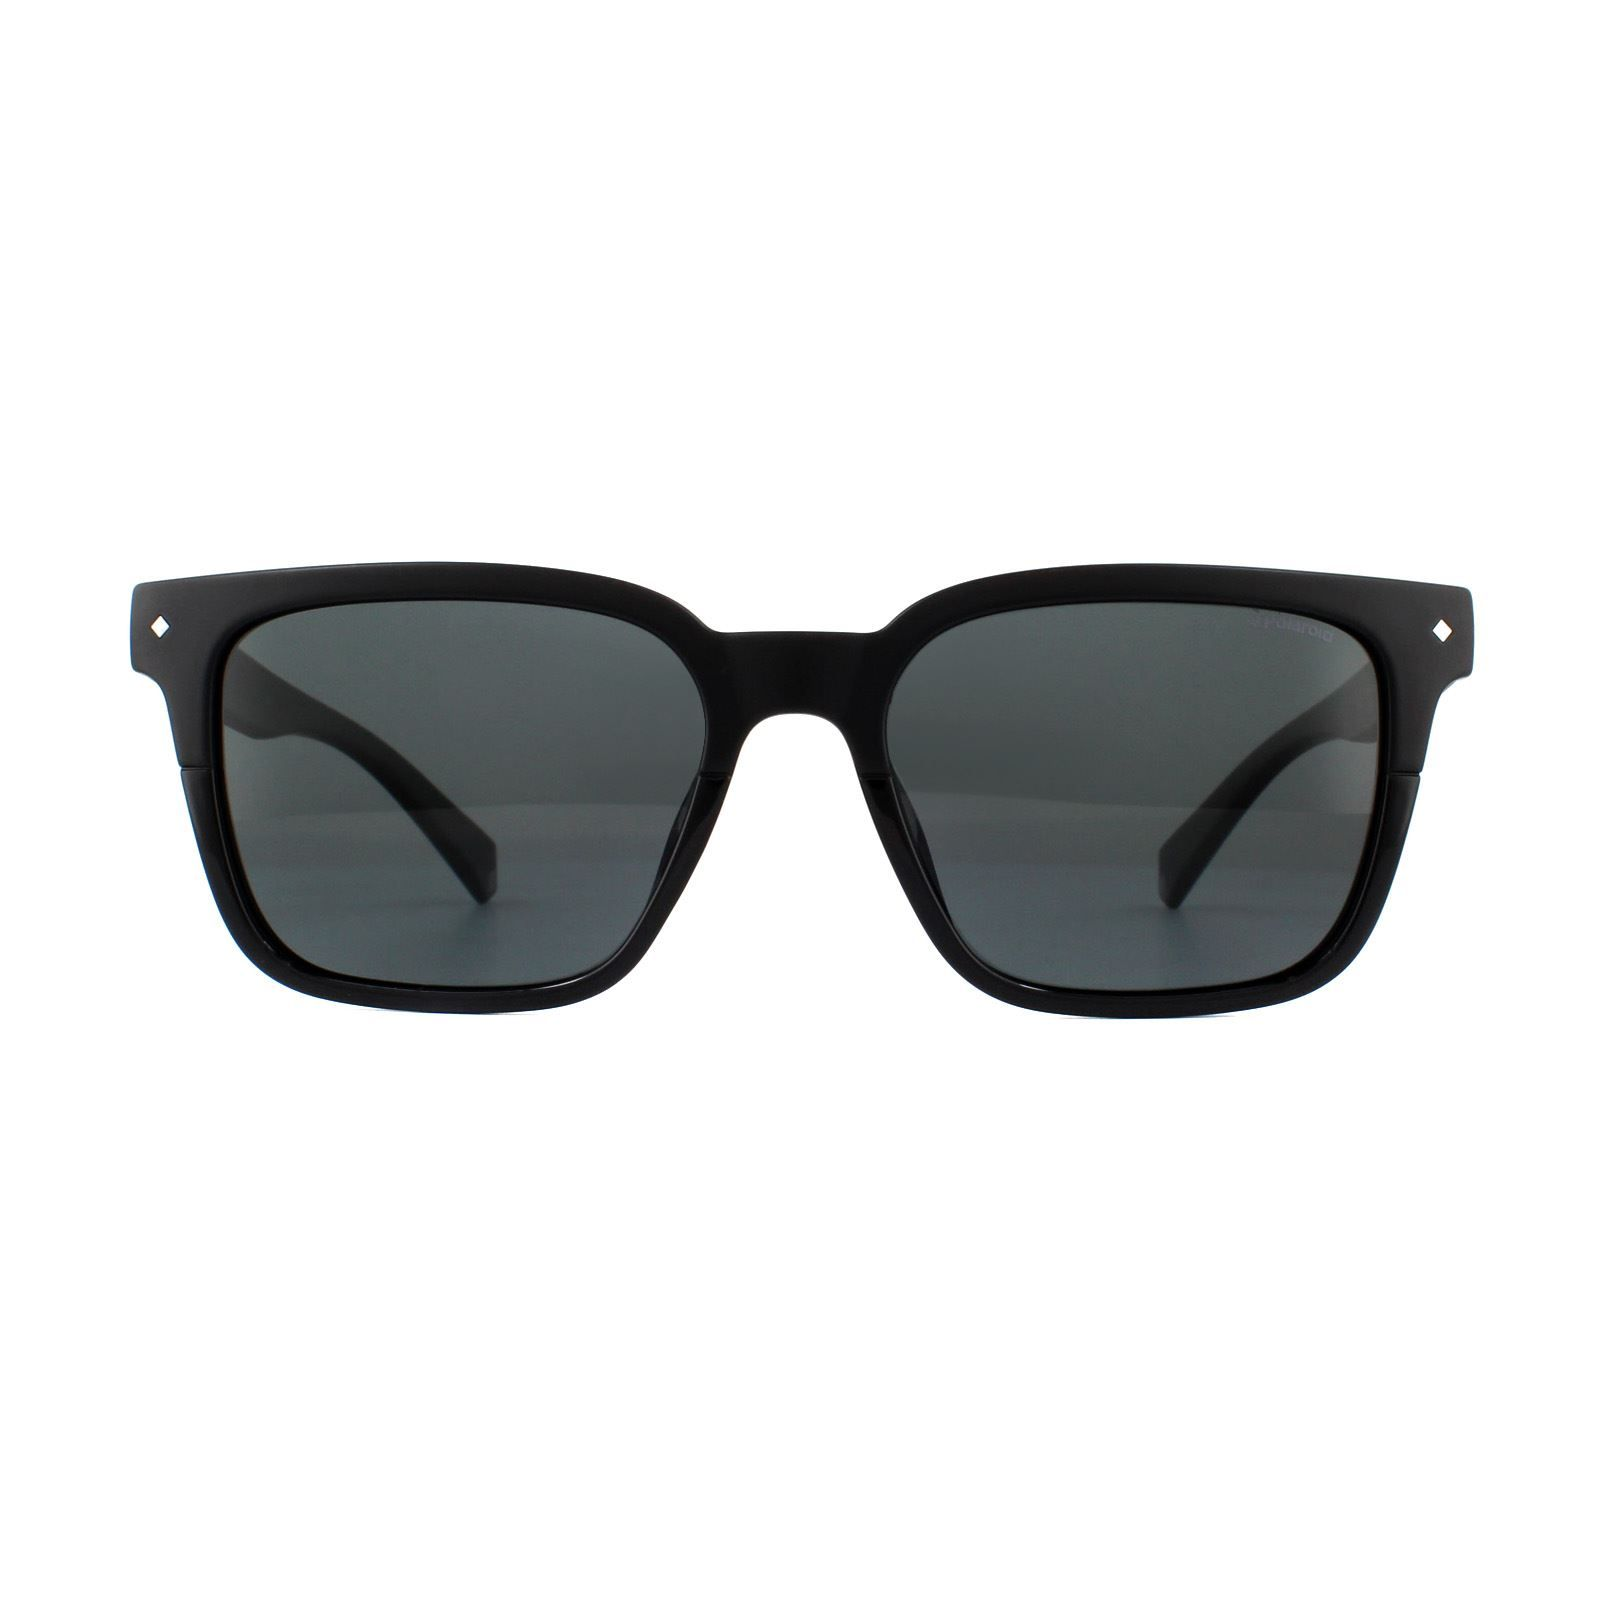 Polaroid Sunglasses PLD 6044/S 807 M9 Black Grey Polarized